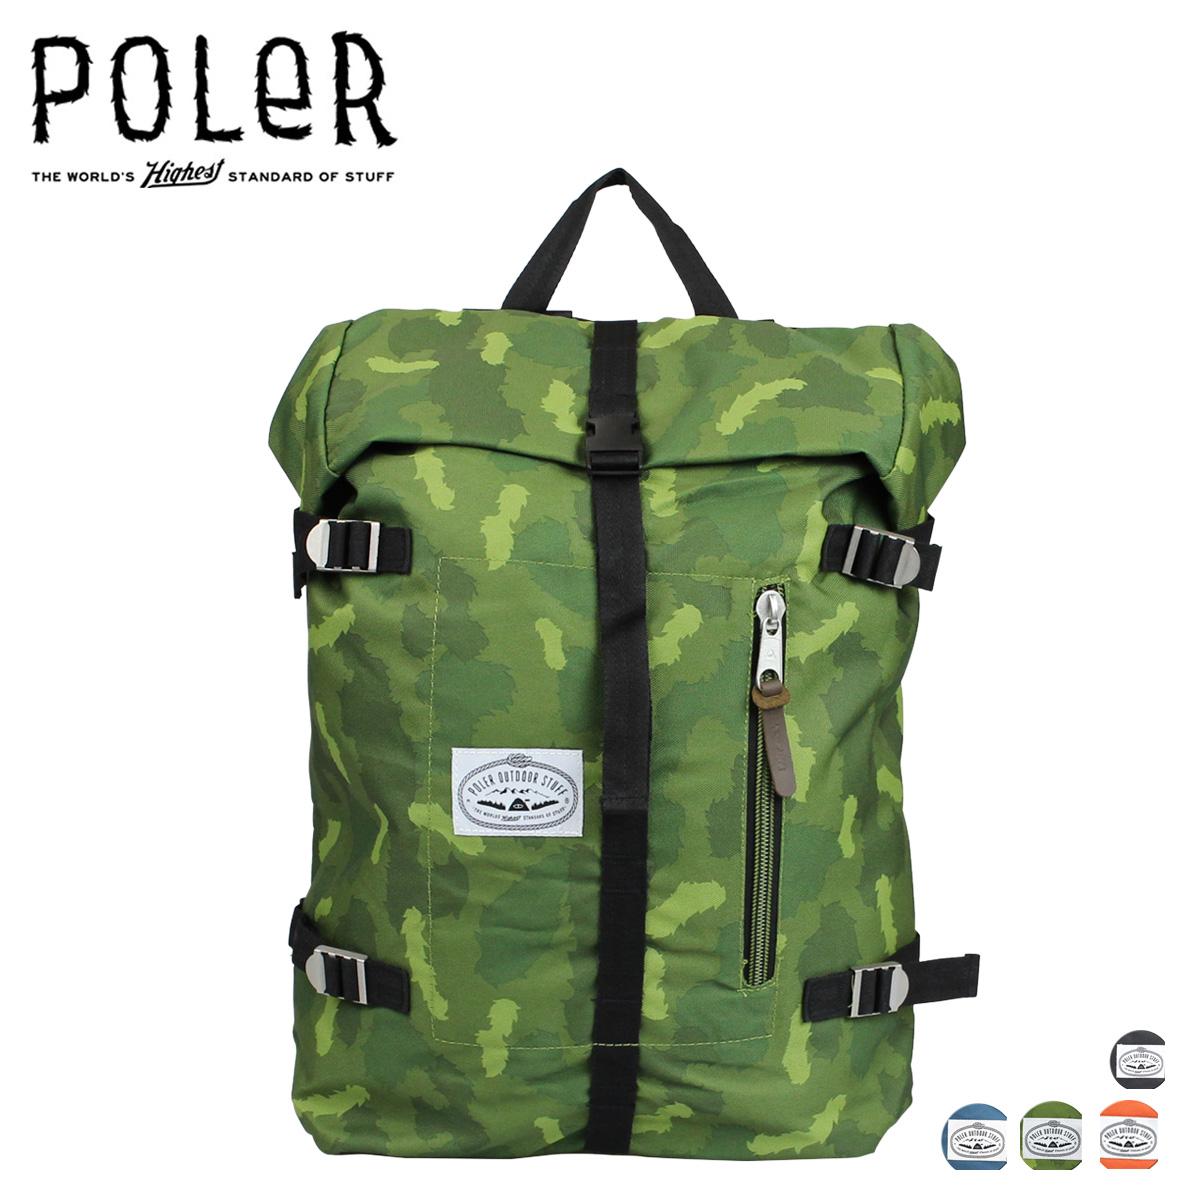 c996728ea Polar POLER mens ladies rucksack backpack 532021 CLASSIC ROLLTOP [9 / 29  new in stock ...